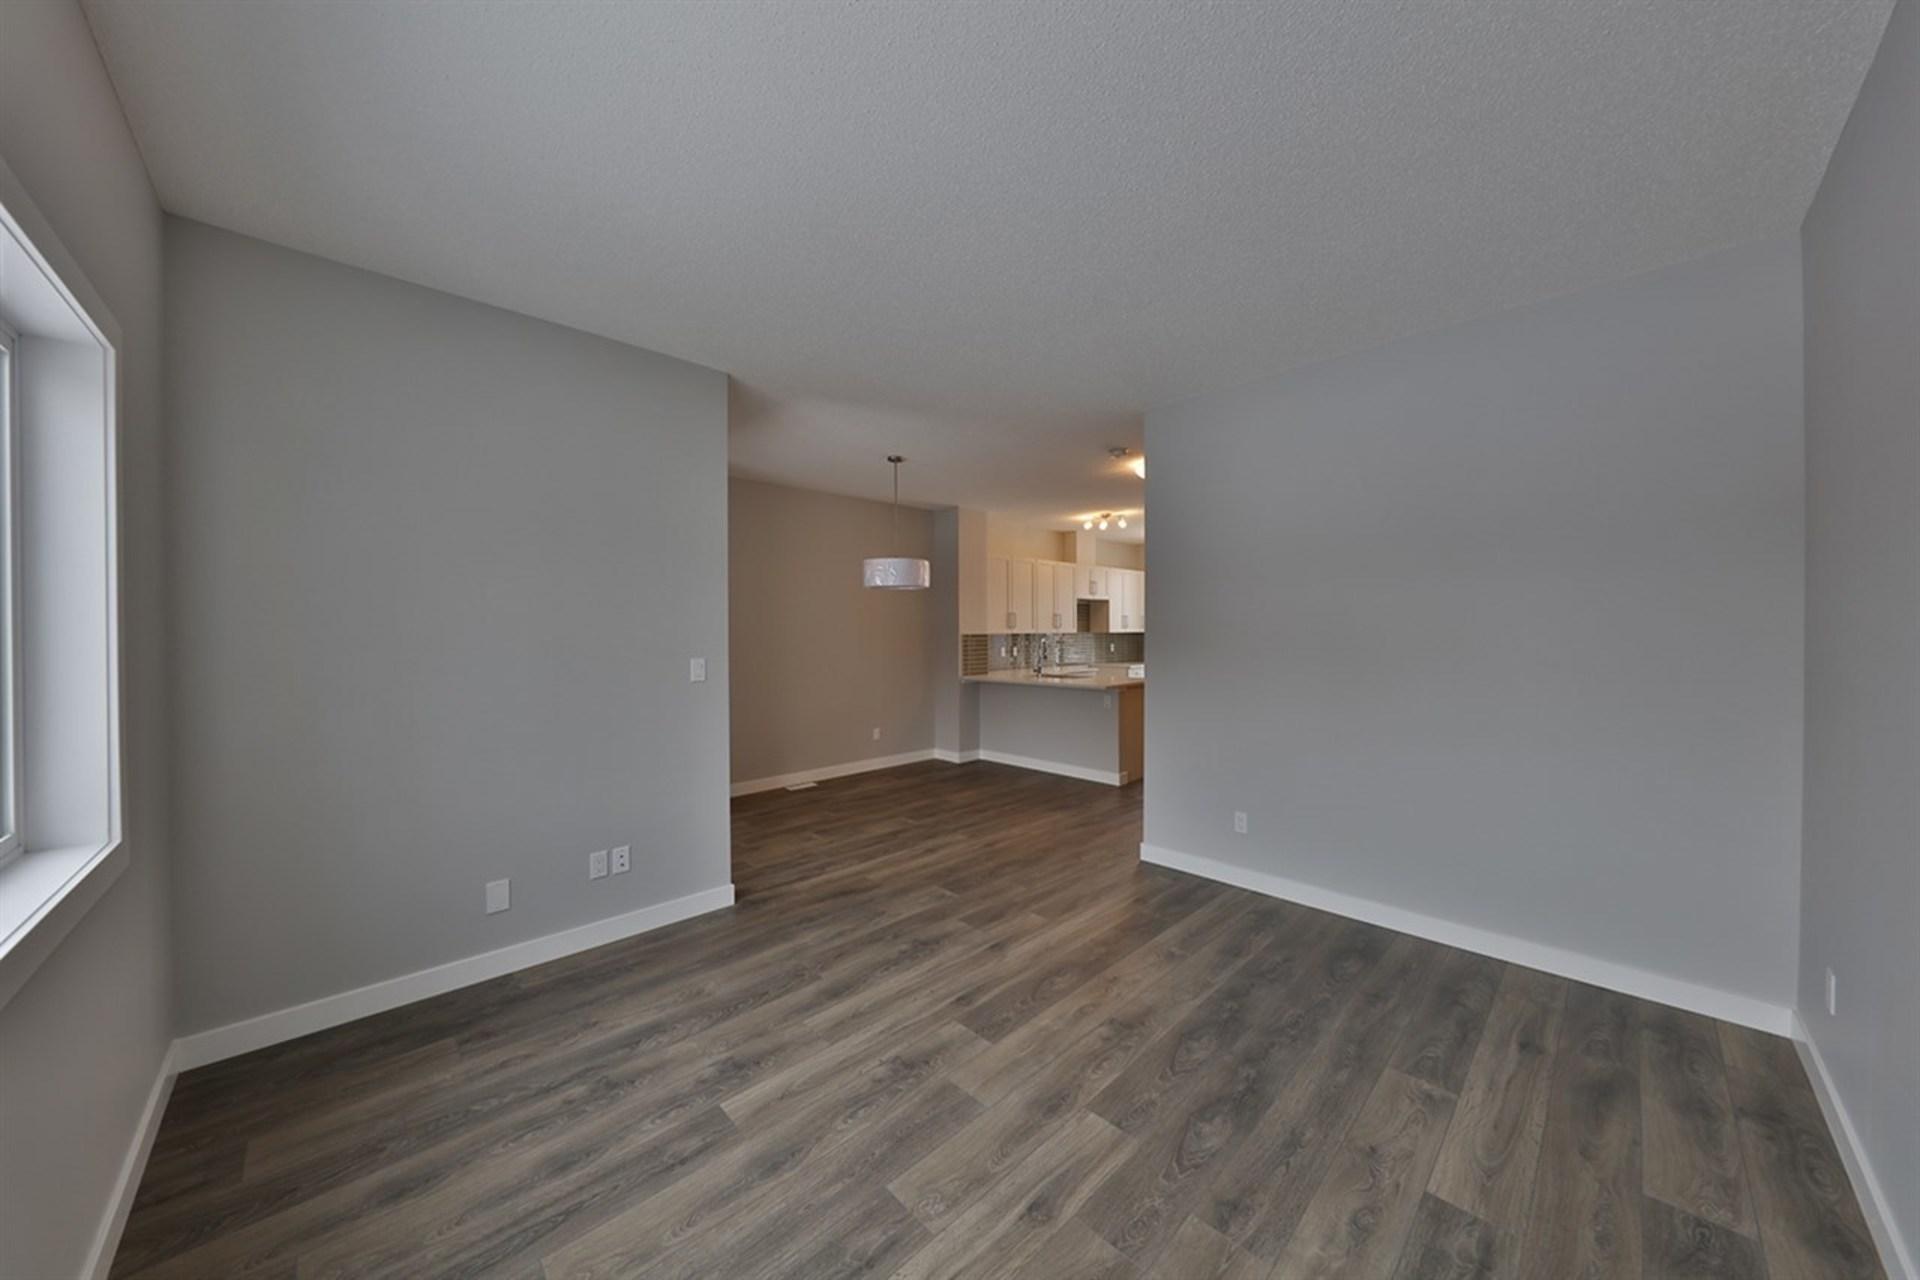 2021-cavanagh-drive-cavanagh-edmonton-07 at 2021 Cavanagh Drive, Cavanagh, Edmonton